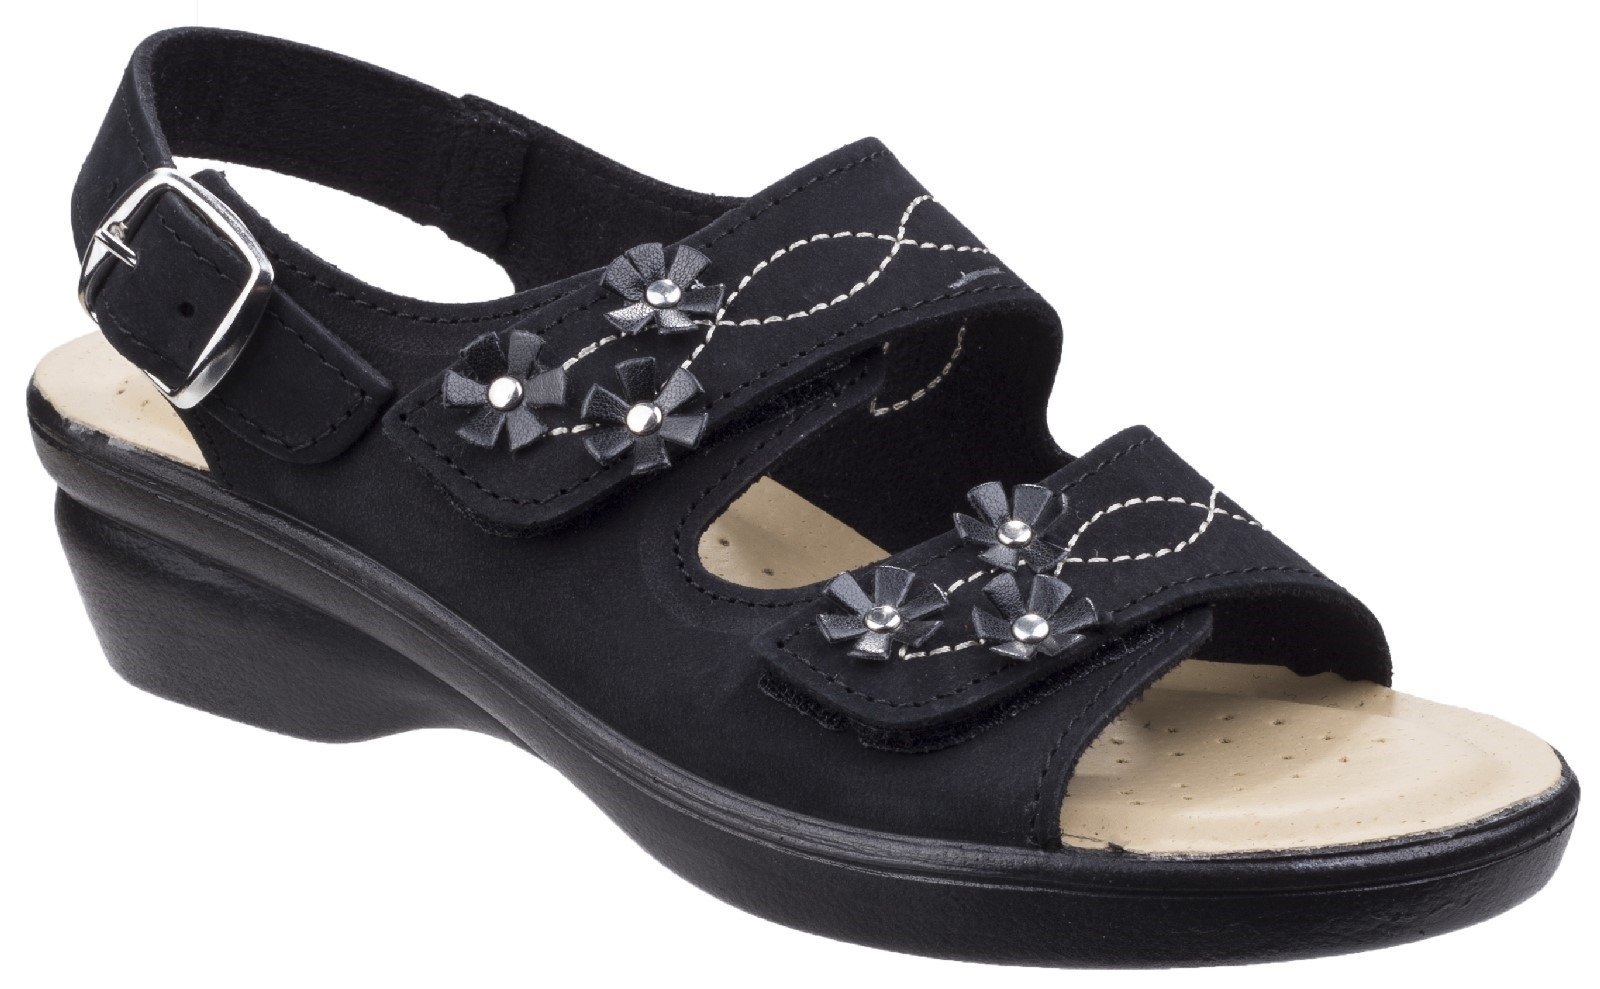 Fleet & Foster Women's Amaretto Touch Fastening Sandal Various Colours 26298 - Black 3